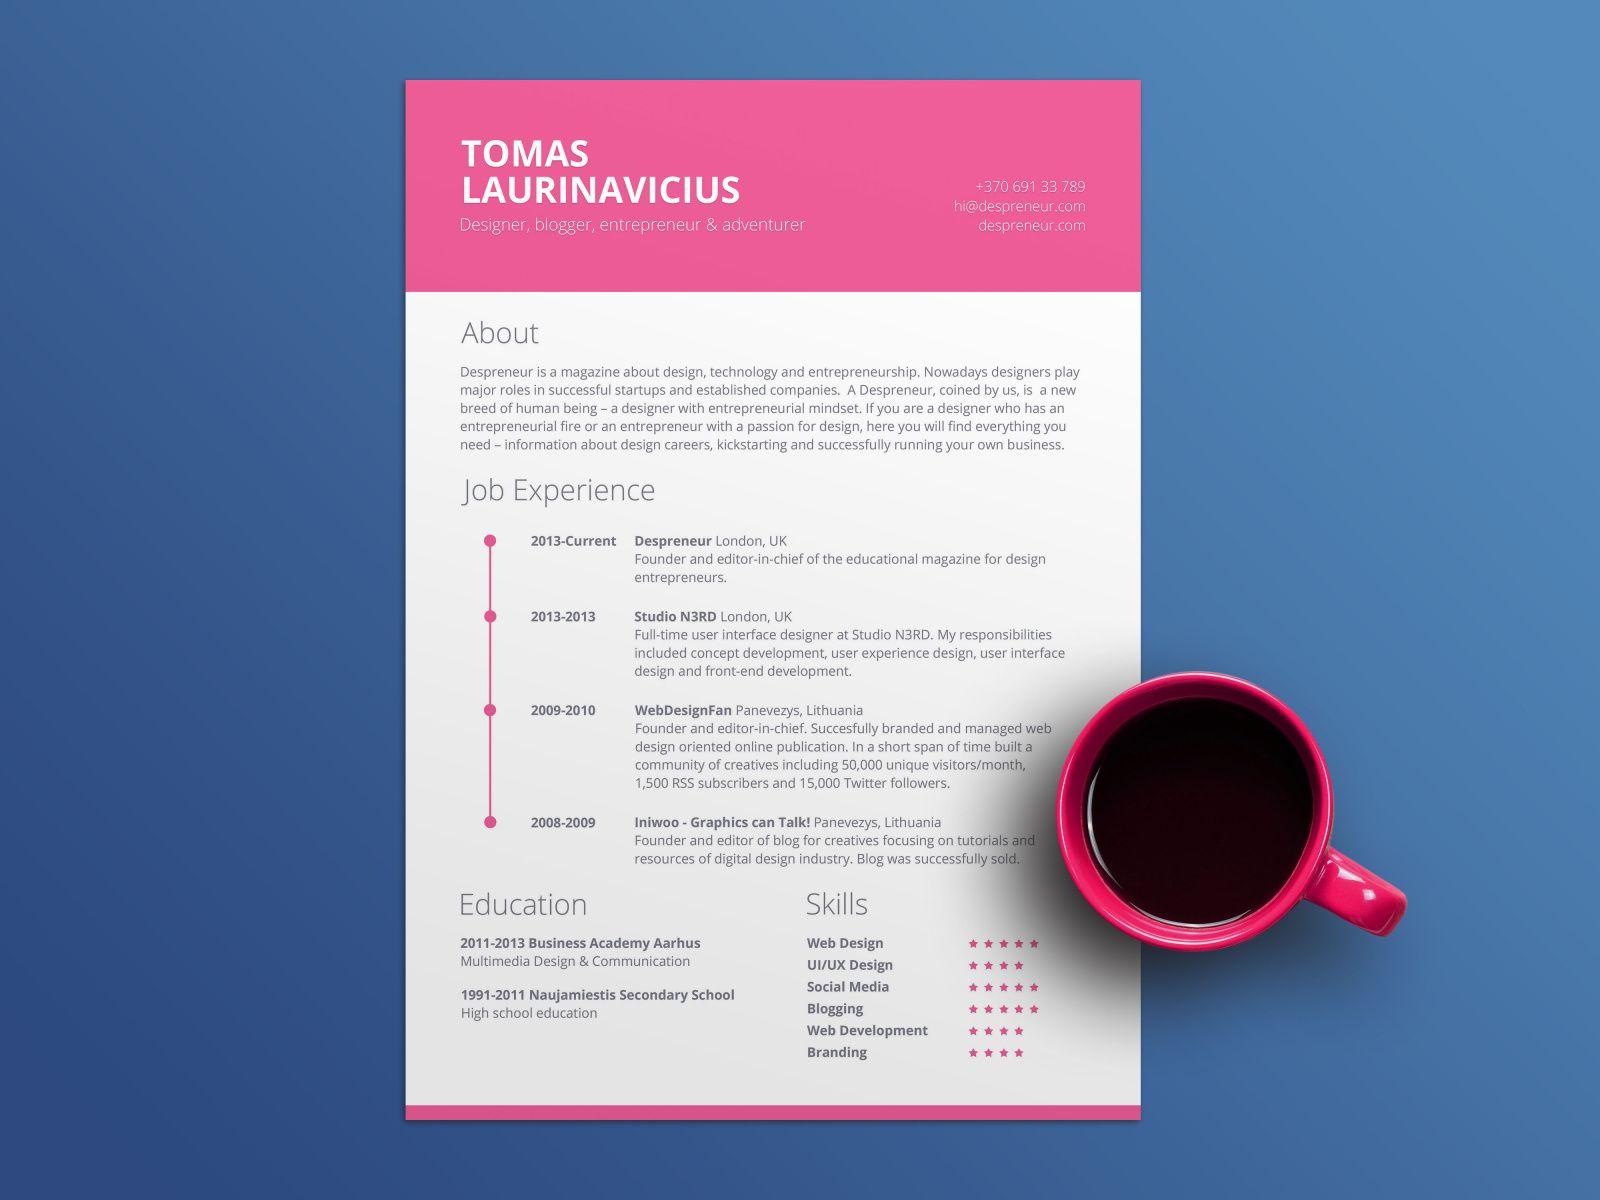 Free Pink CV Resume Template - Cv resume template, Resume template, Resume design template, Resume template free, Templates, Resume - 30vIg3G